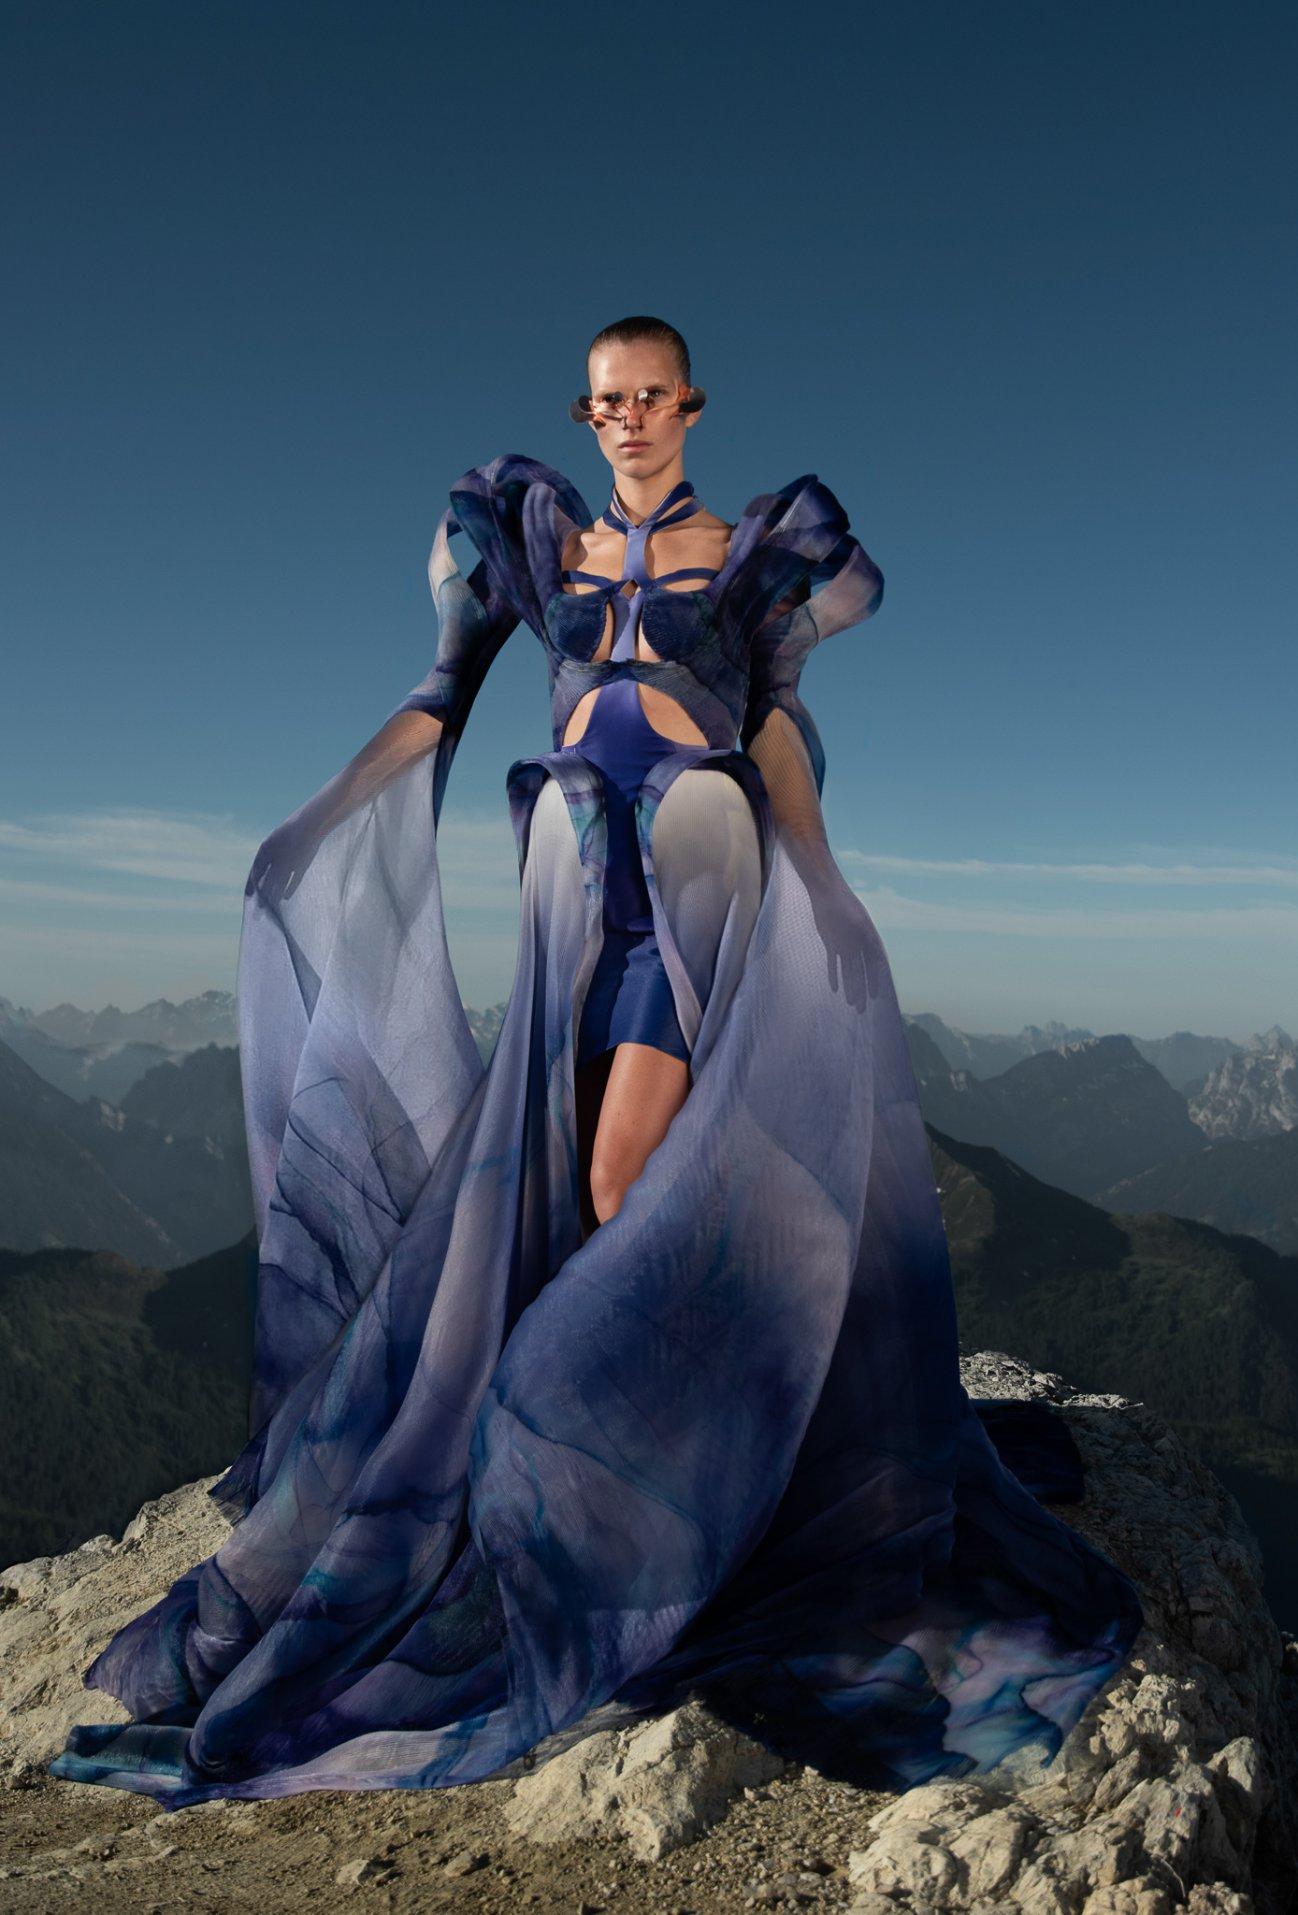 Iris-van-Herpen-AW21_22-Earthrise-Photography-by-Siermond-Nicholas-Fols-V